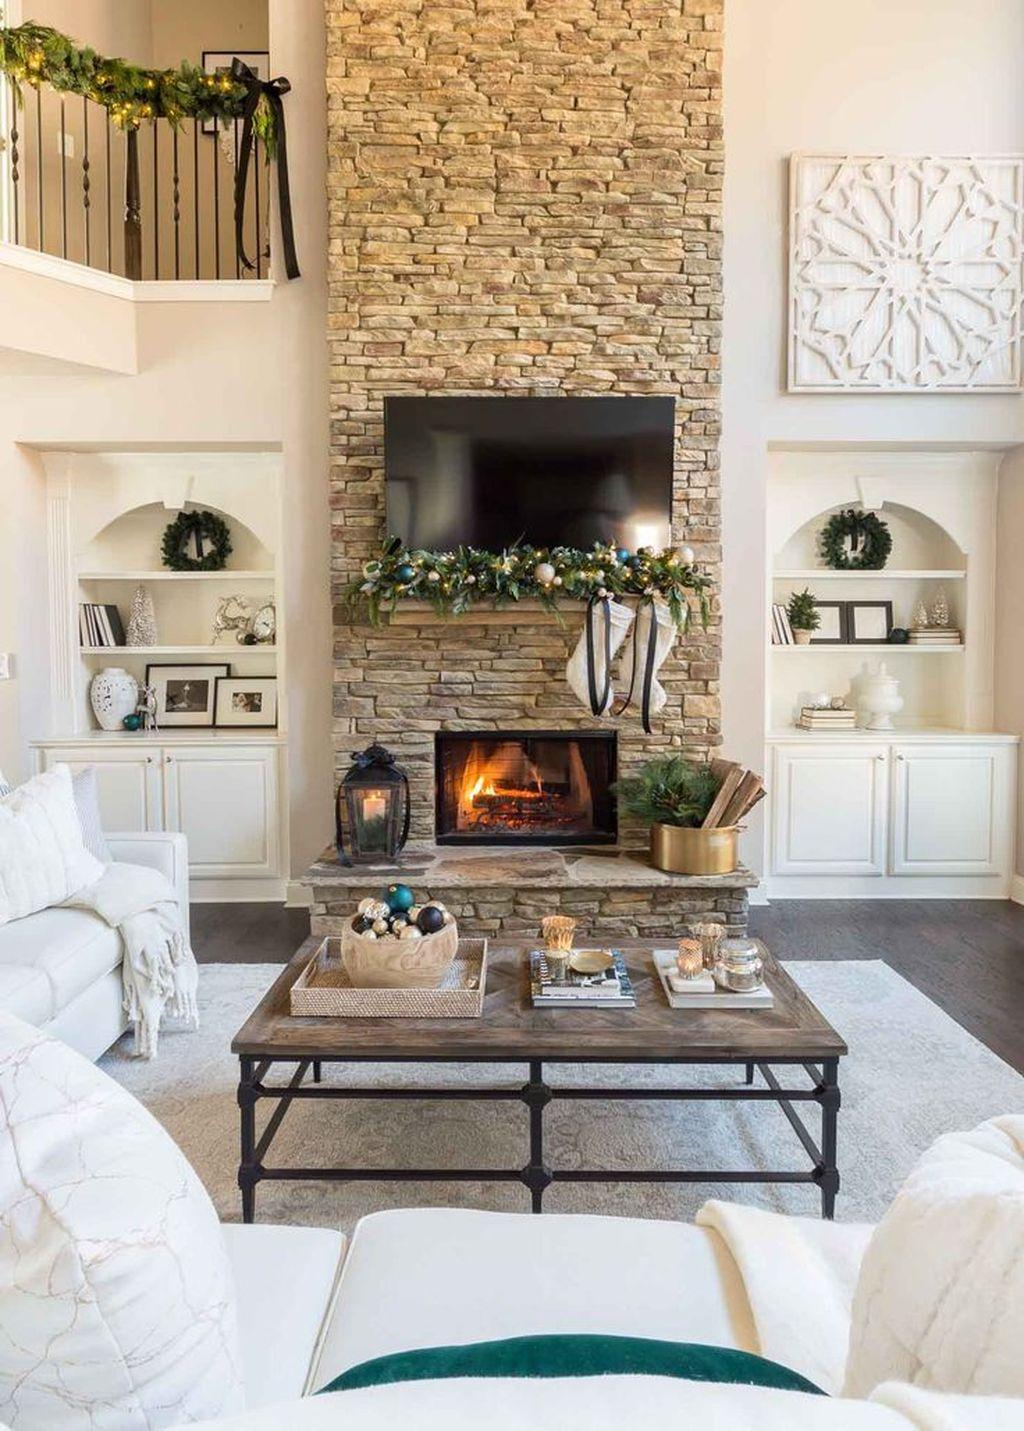 Enchanting Living Room Decor Ideas That Trending This Winter 23